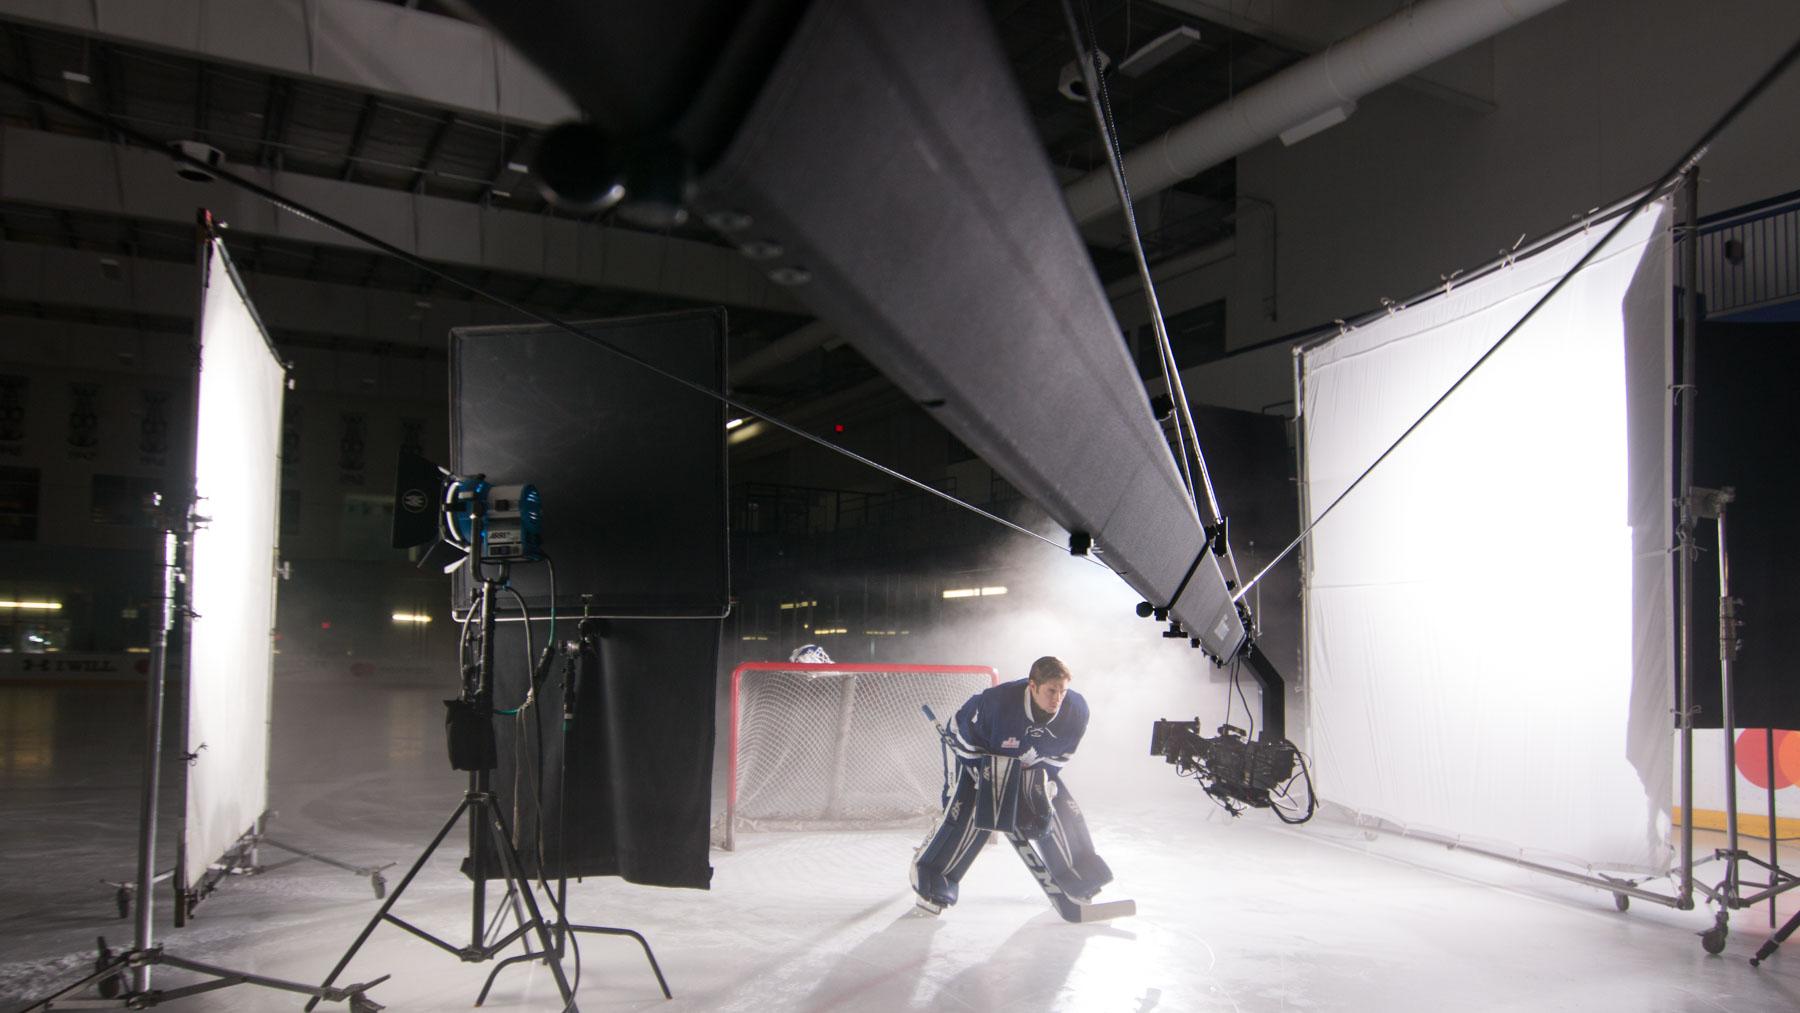 24' Jimmy Jib Triangle shooting Toronto Maple Leafs Media Day